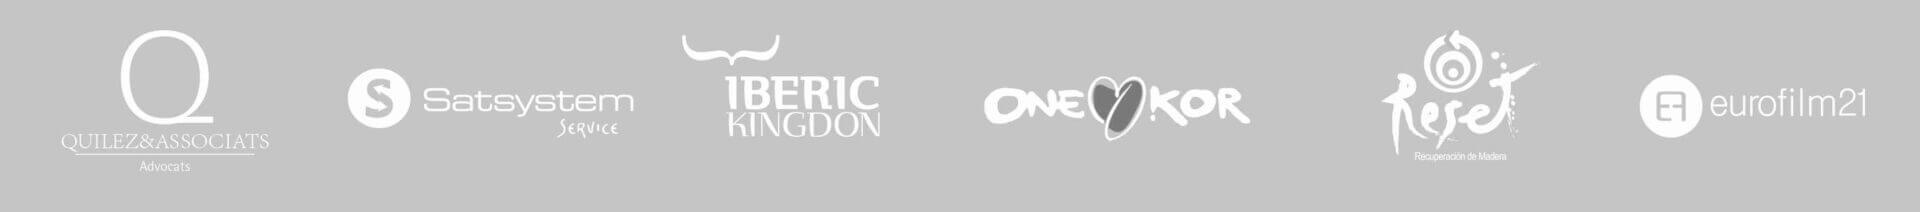 Logotipos + Marcas + Clientes